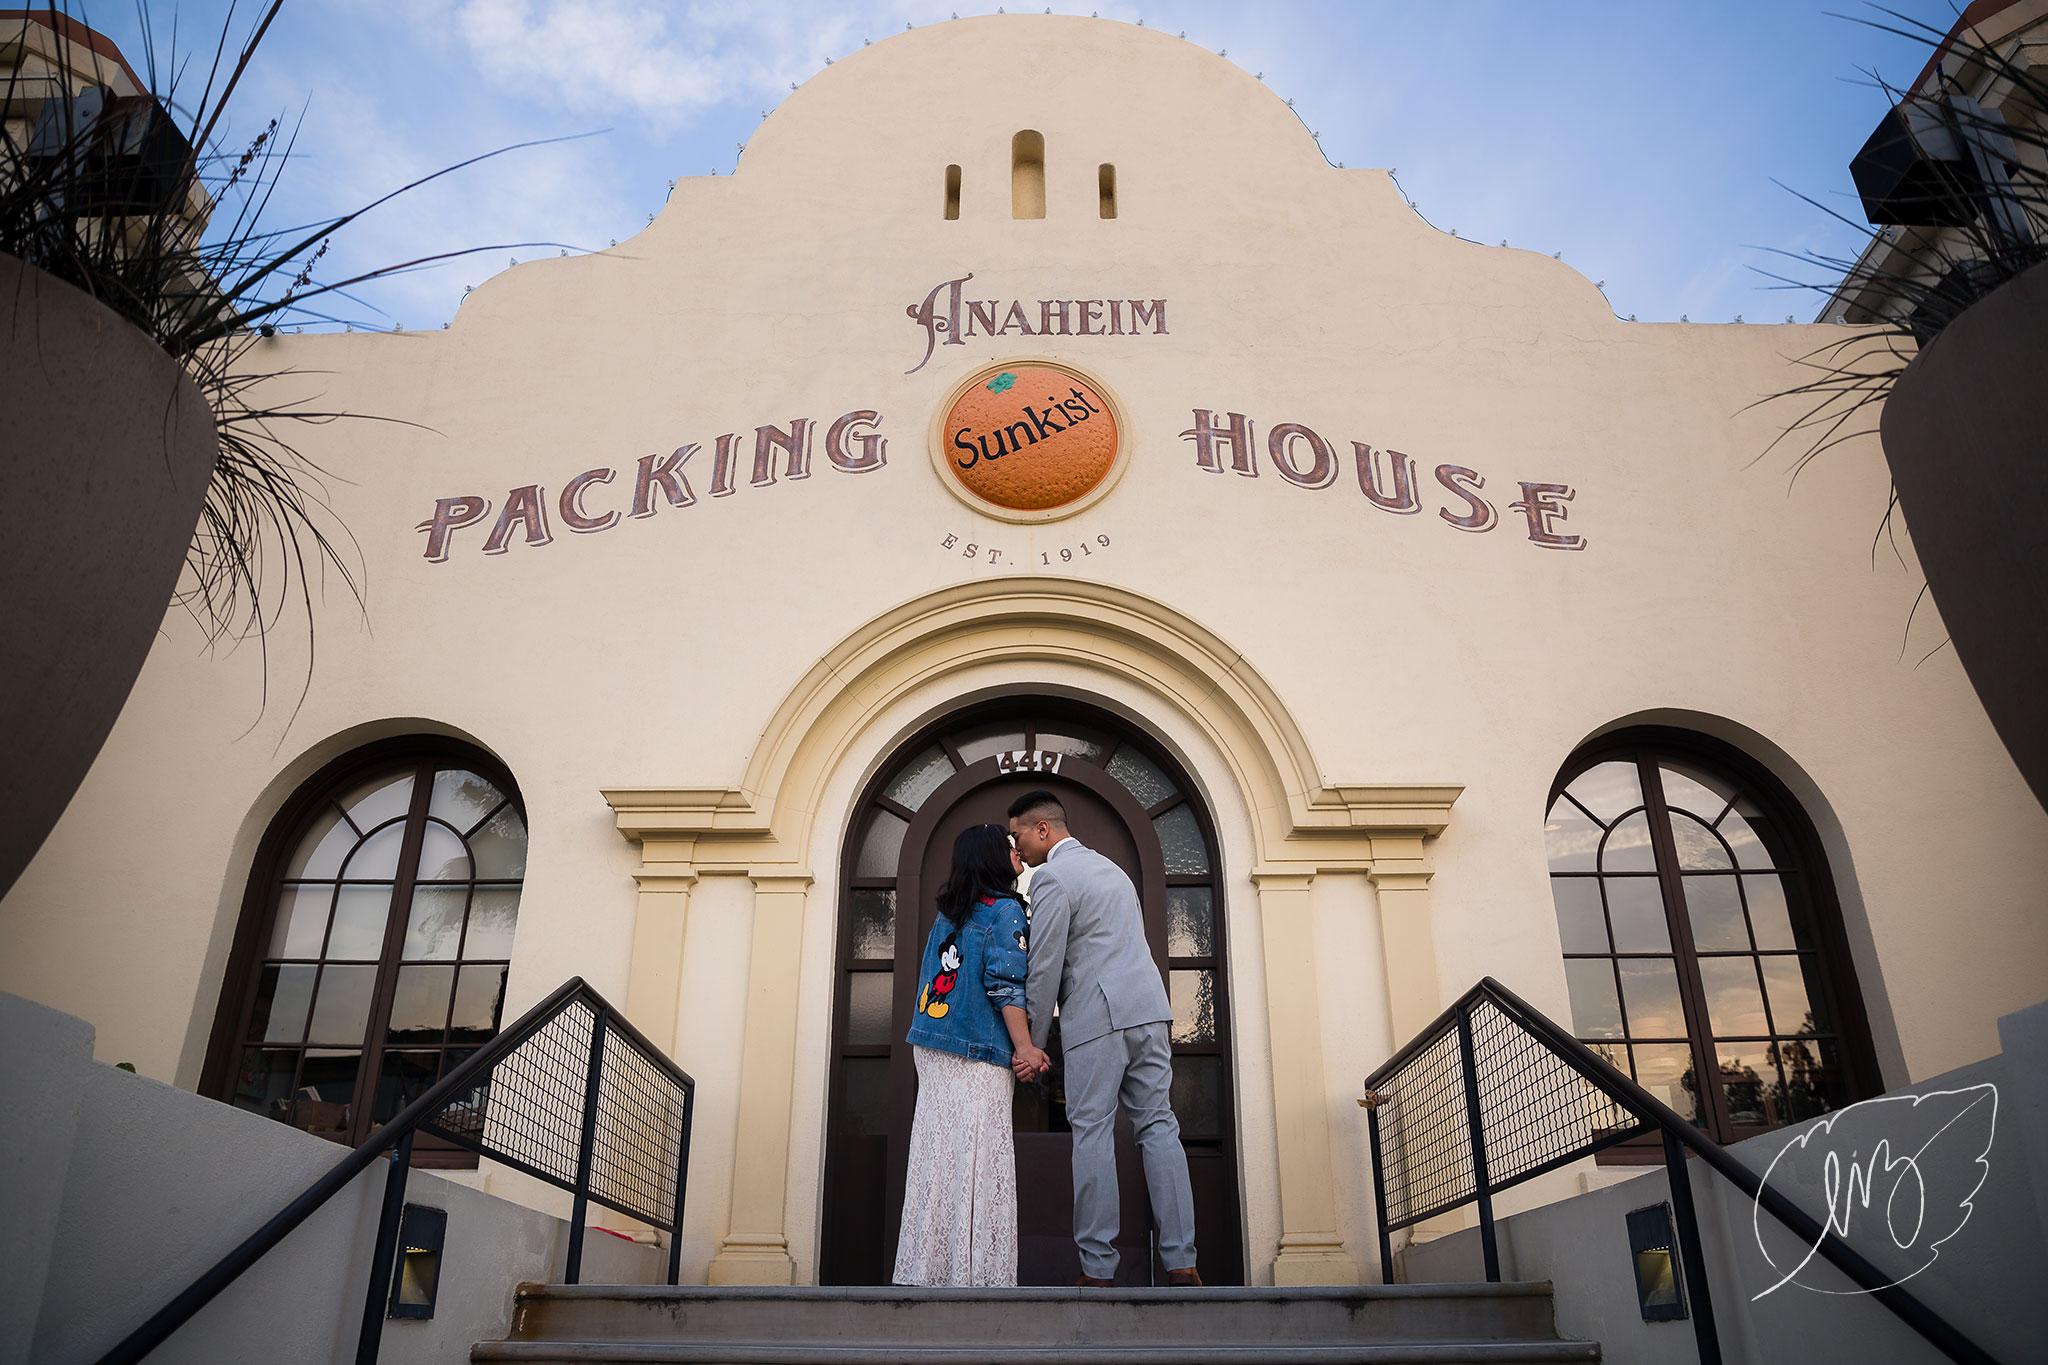 California_Orange_County_Wedding_Photographer_45.jpg